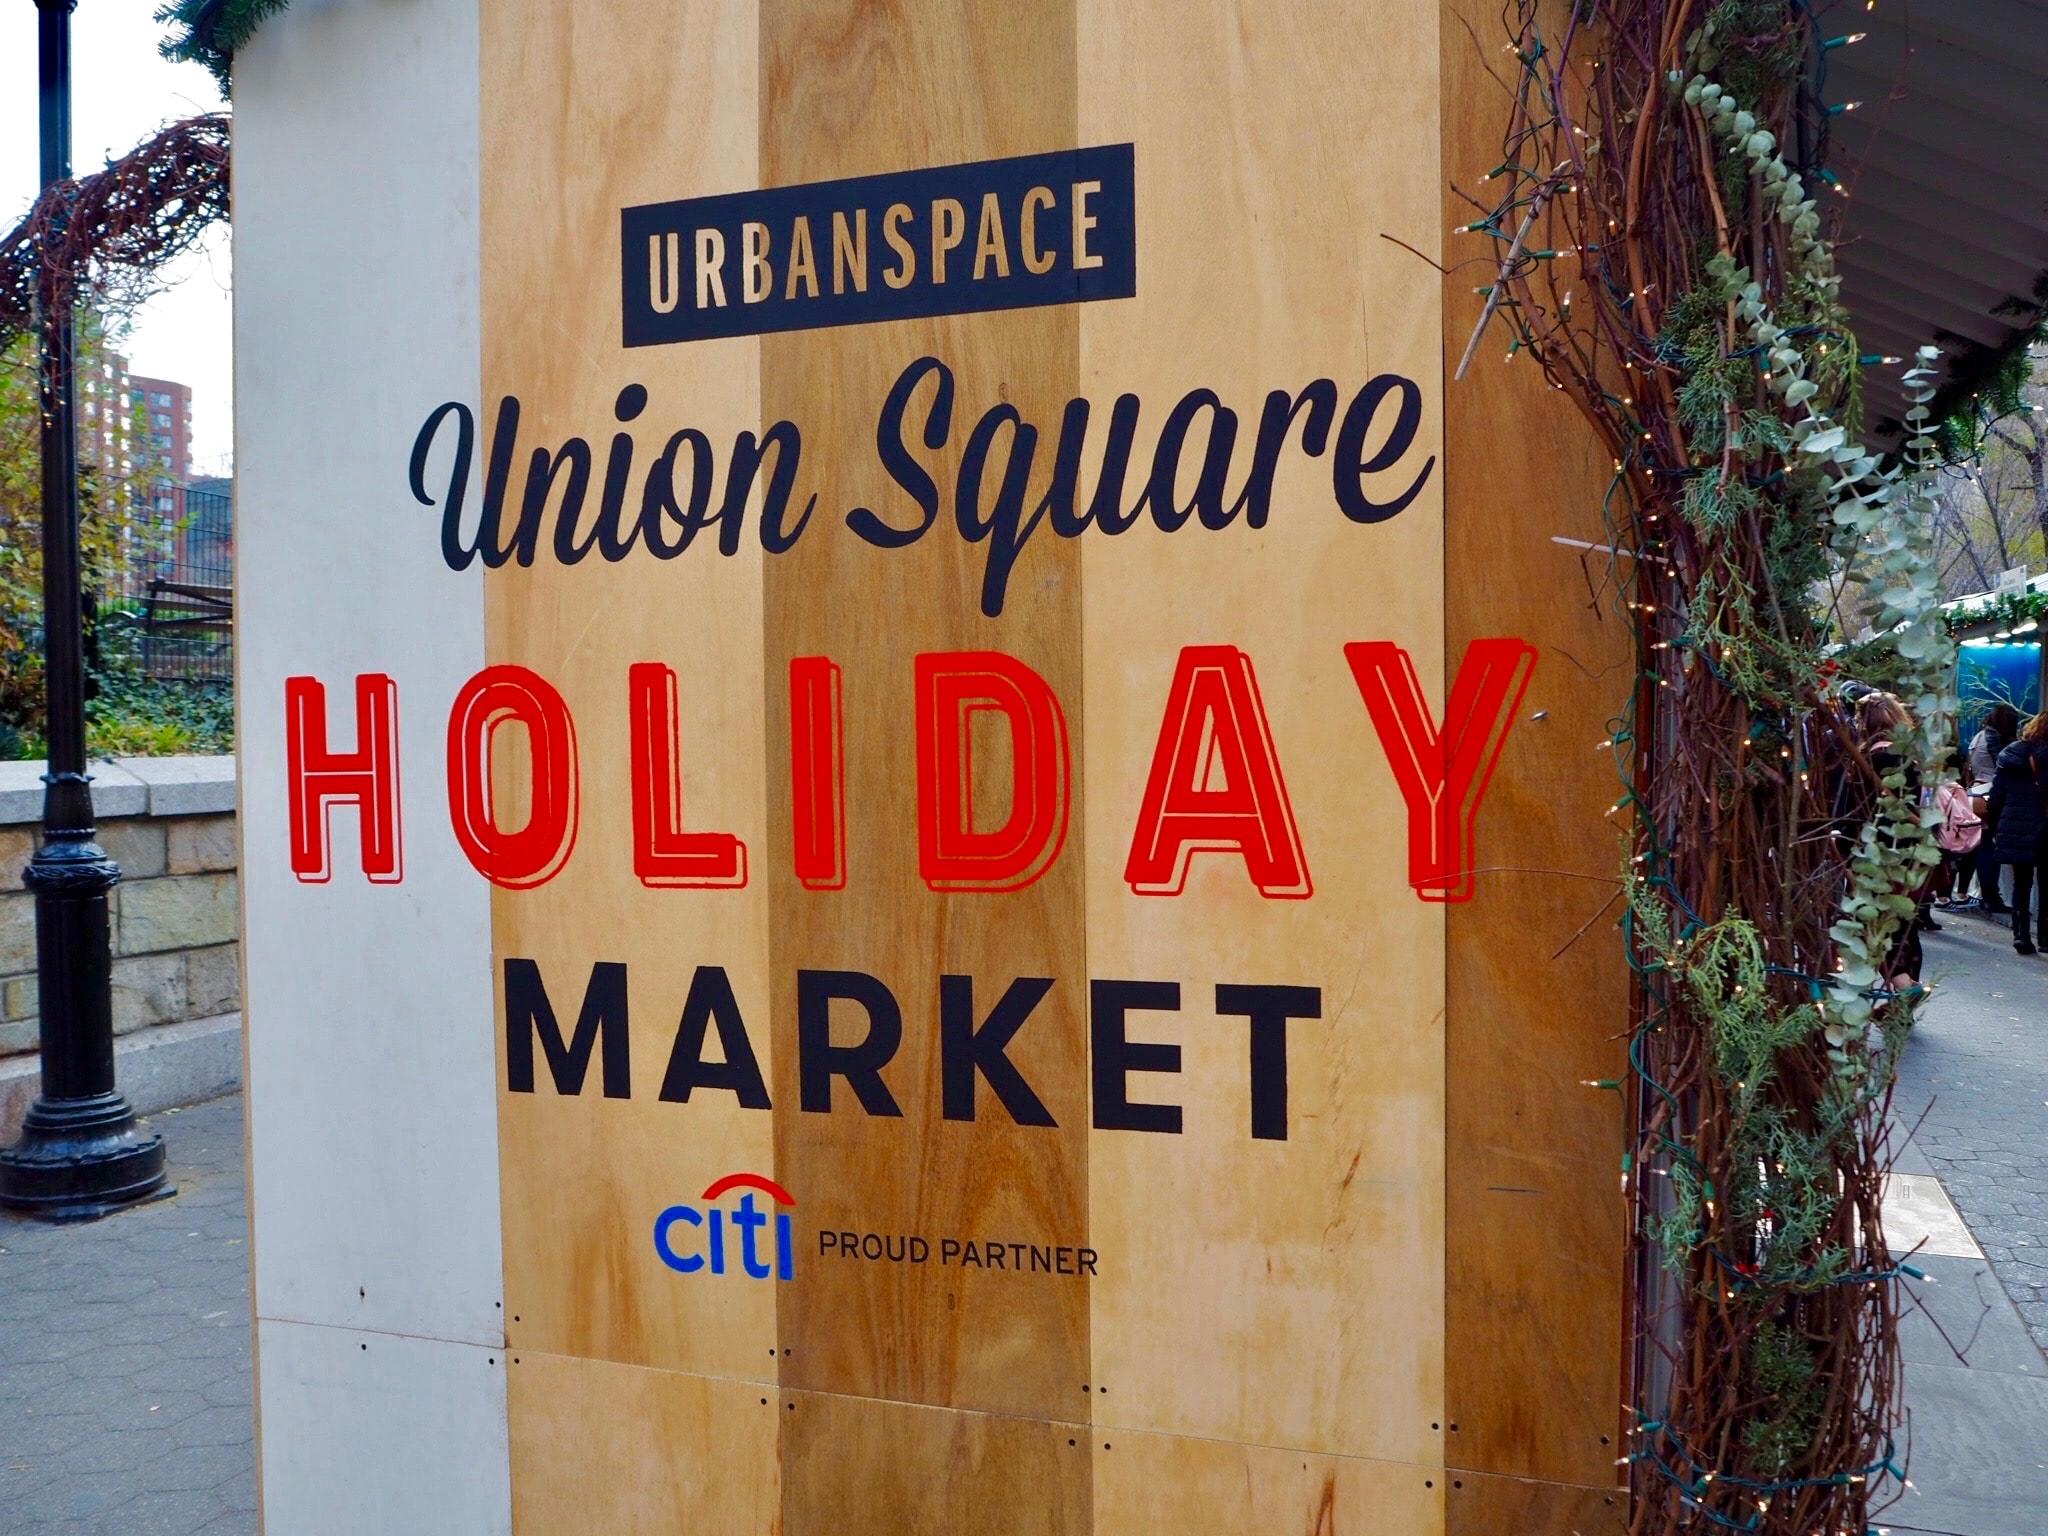 USQ Holiday Market | © Nikki Vargas/Culture Trip